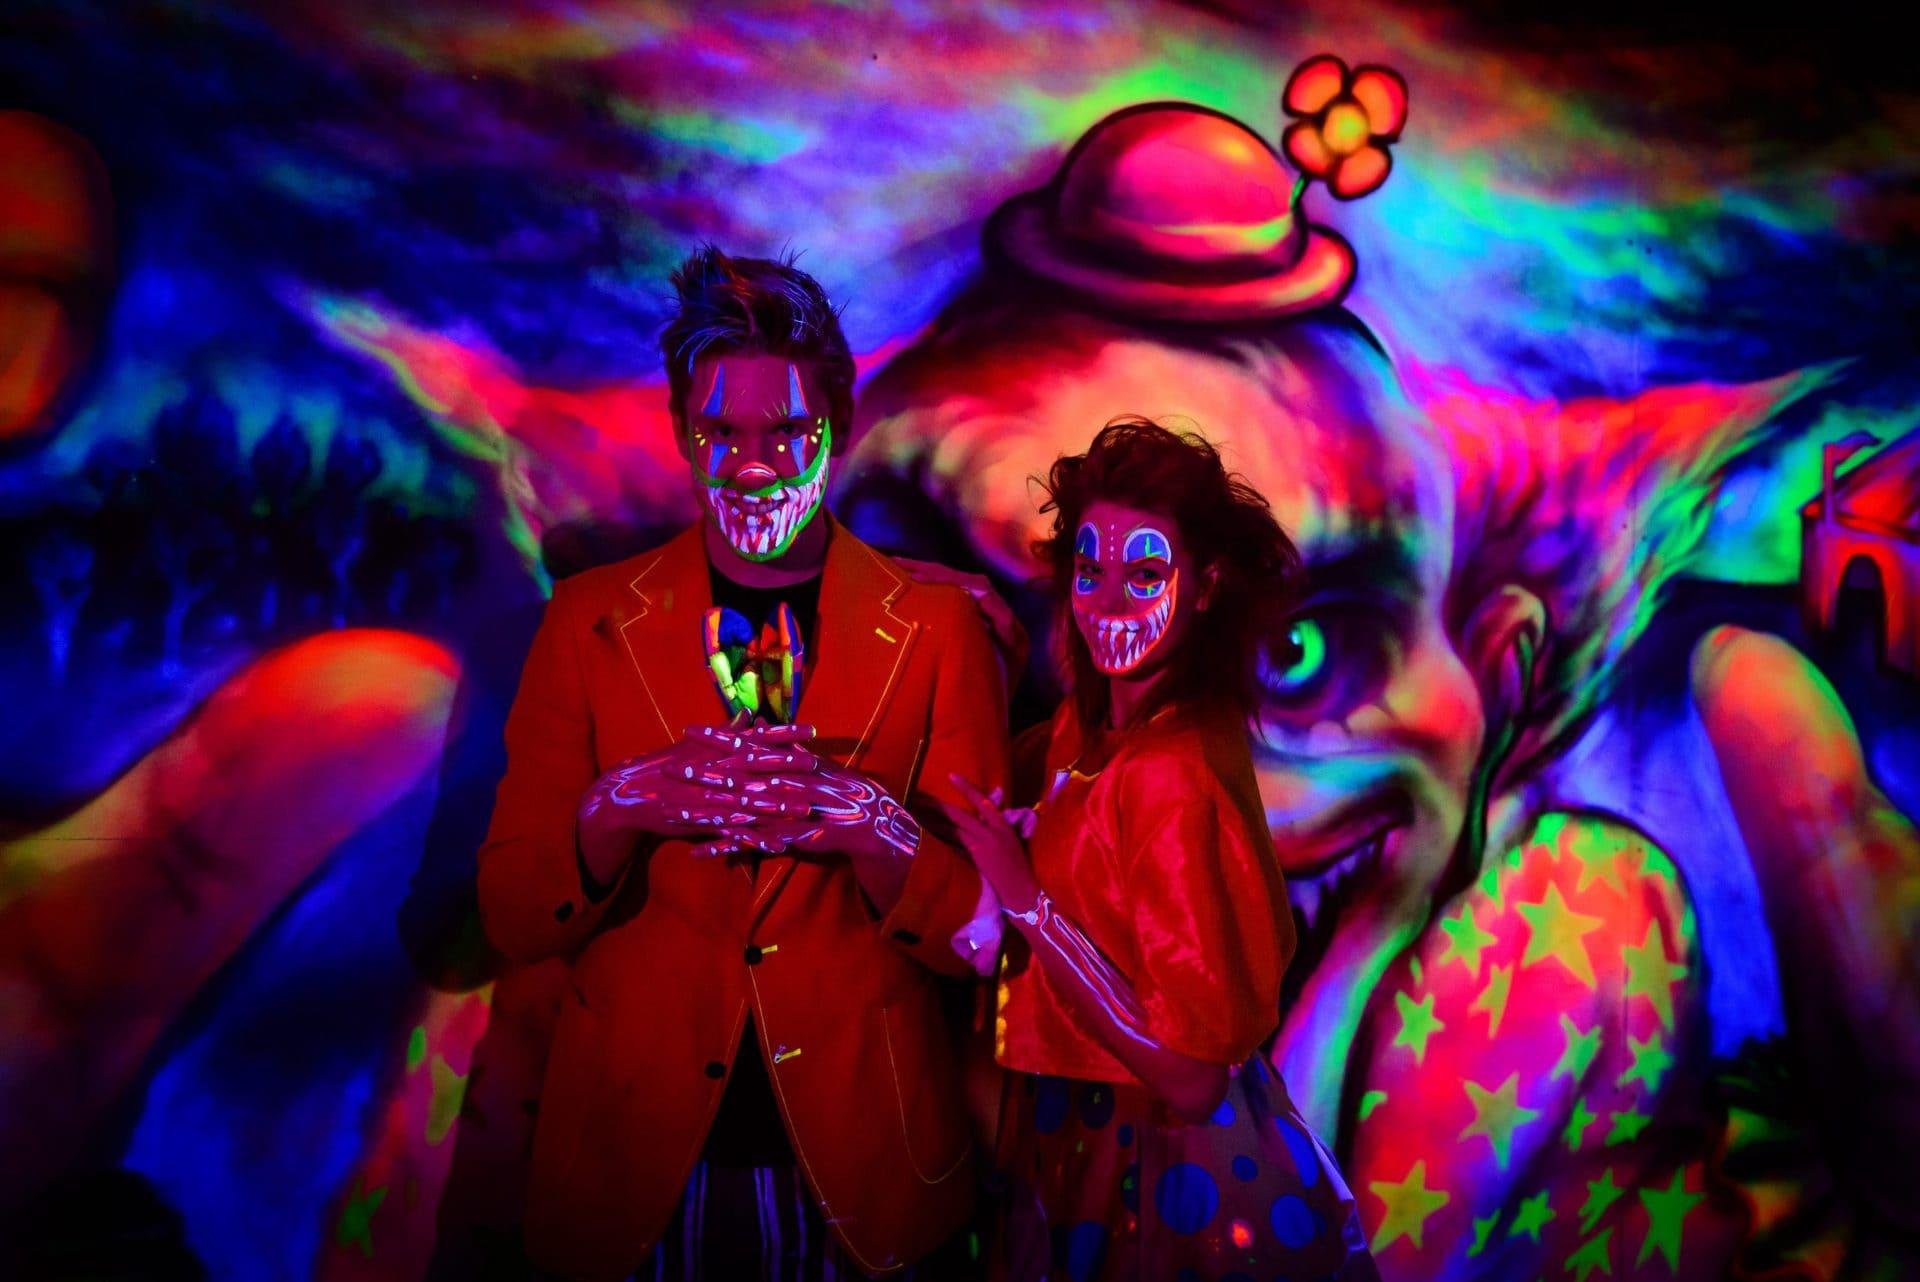 Cirkus DYSTOPIA Tivoli Friheden Halloween efterårsferien